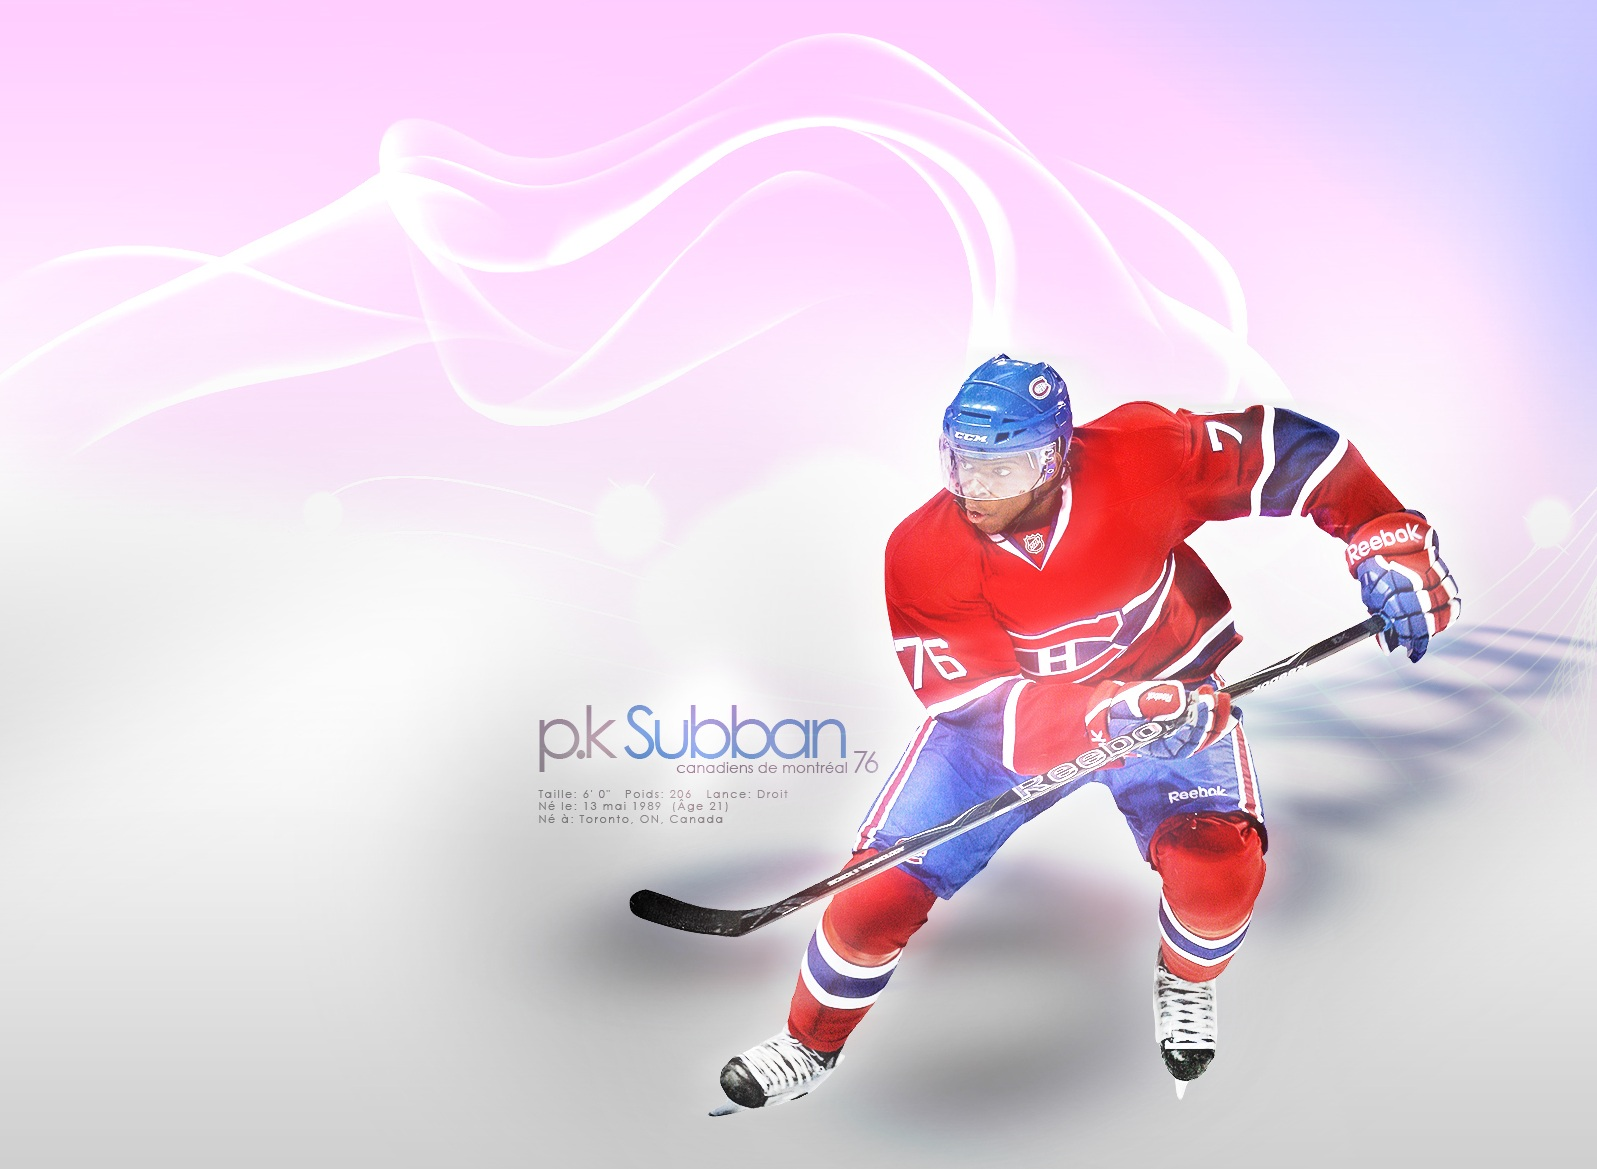 Carey price wallpapers montreal habs montreal hockey 9 html code - Hockey P_k_ Subban Montreal Canadiens Wallpaper